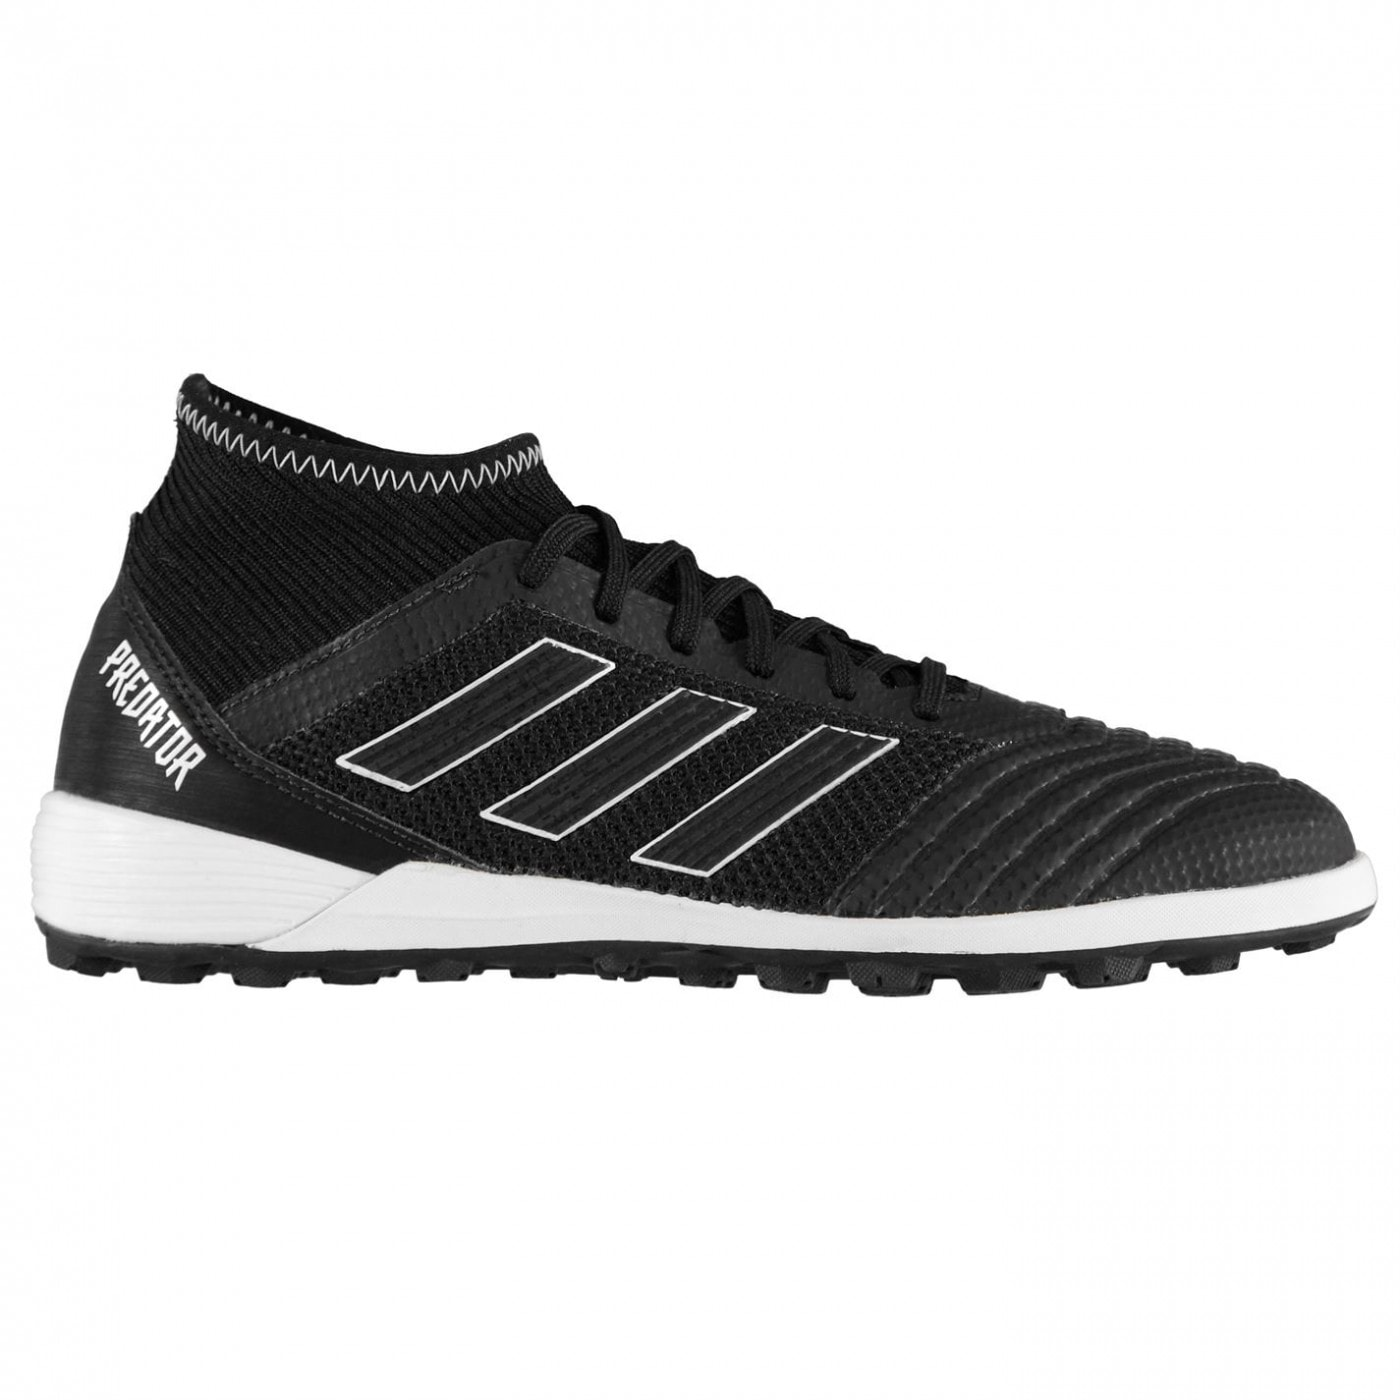 Adidas Predator Tango 18.3 Mens Astro Turf Trainers